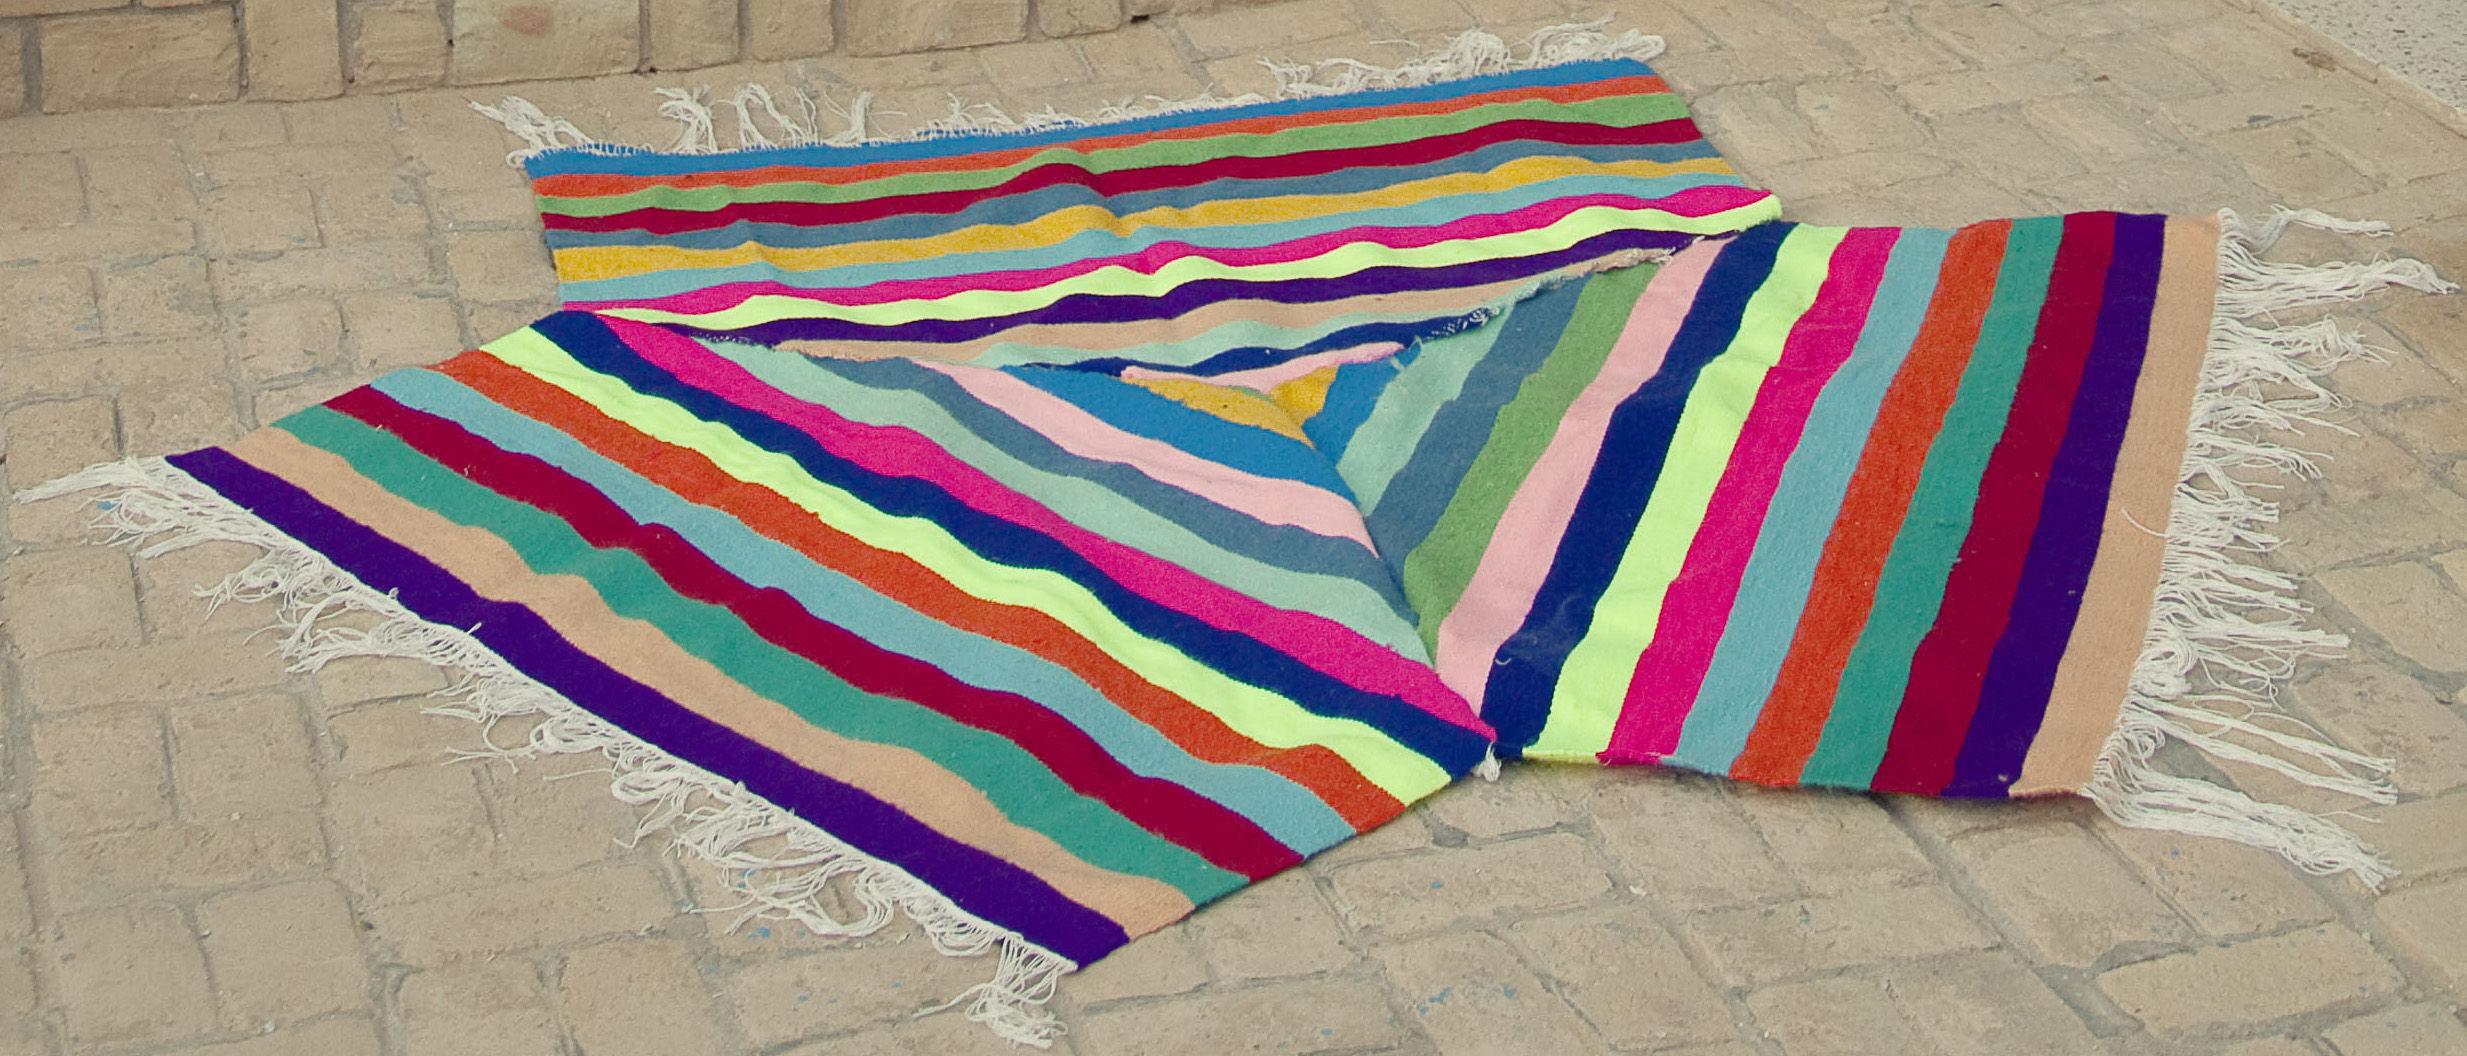 Tapis kilim de convivialit 3 places grand mod le l 190 - Made in design tapis ...